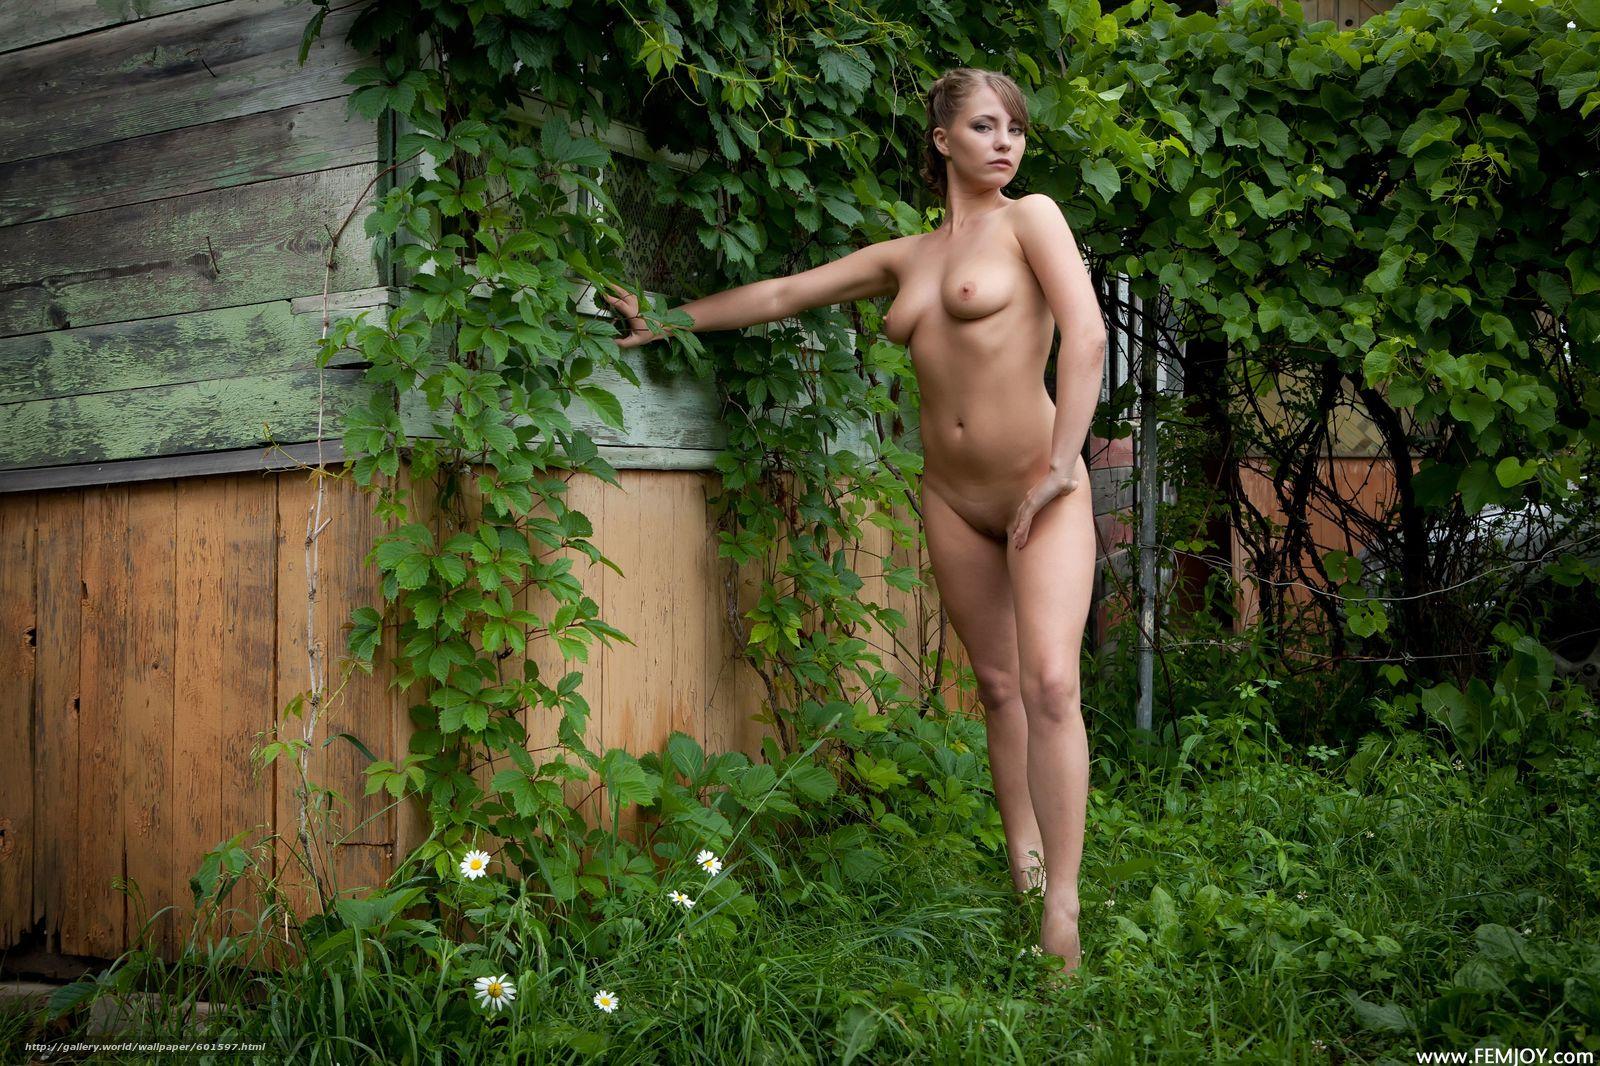 Эротическе фото девушек на даче 7 фотография